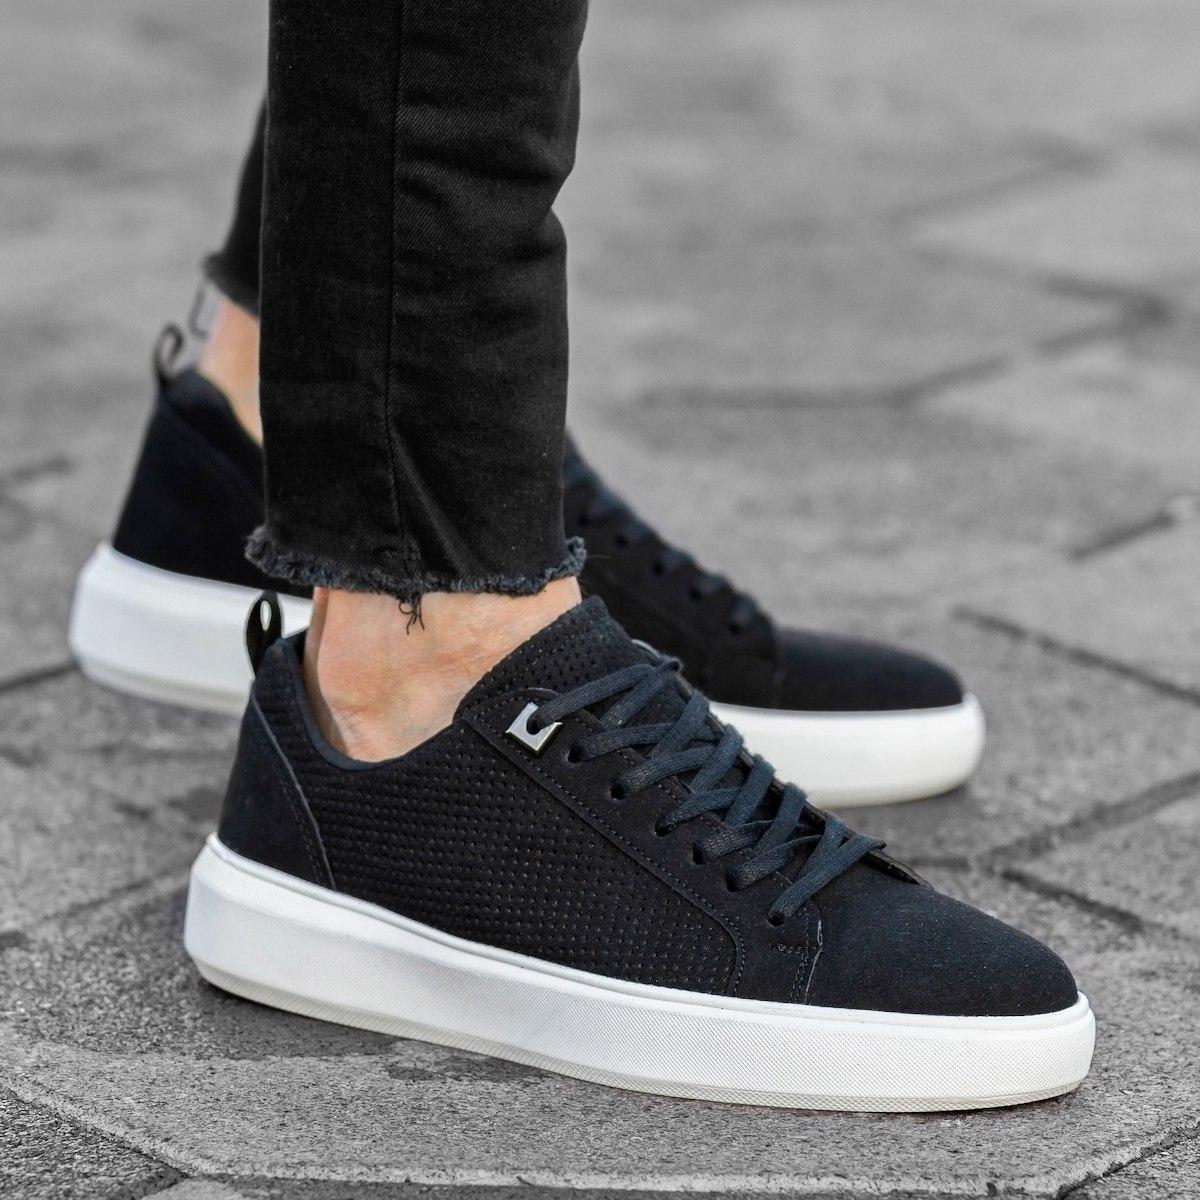 Premium Suede Sneakers in Black White